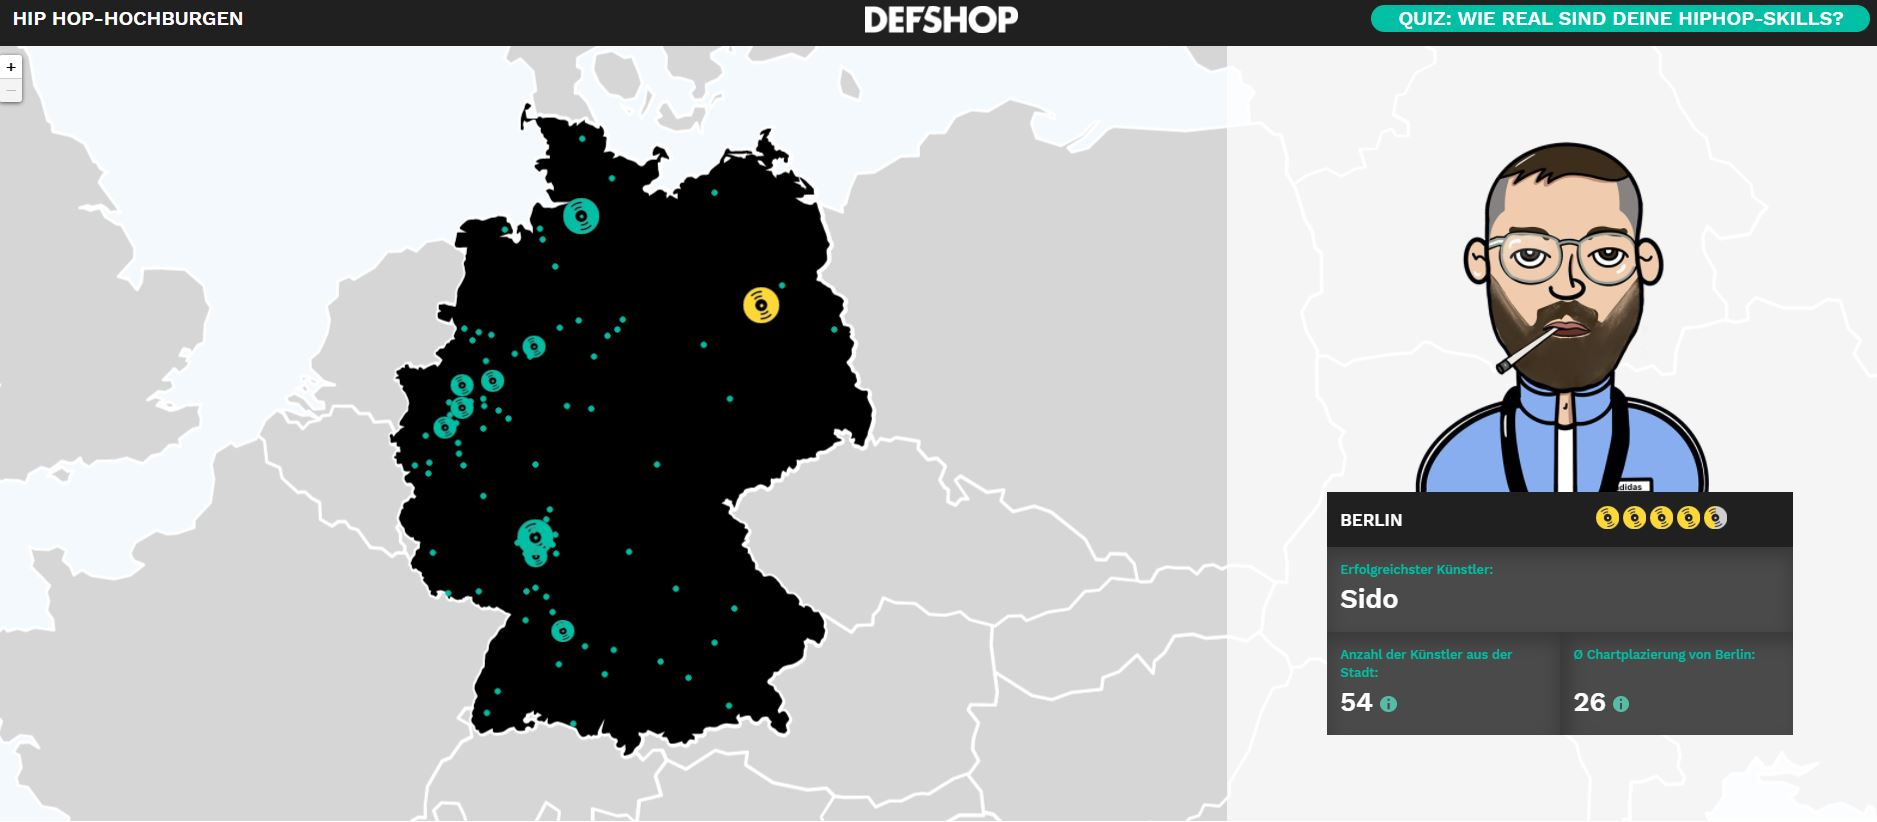 DefShop Map Hip Hop Hochburgen Deutschlands